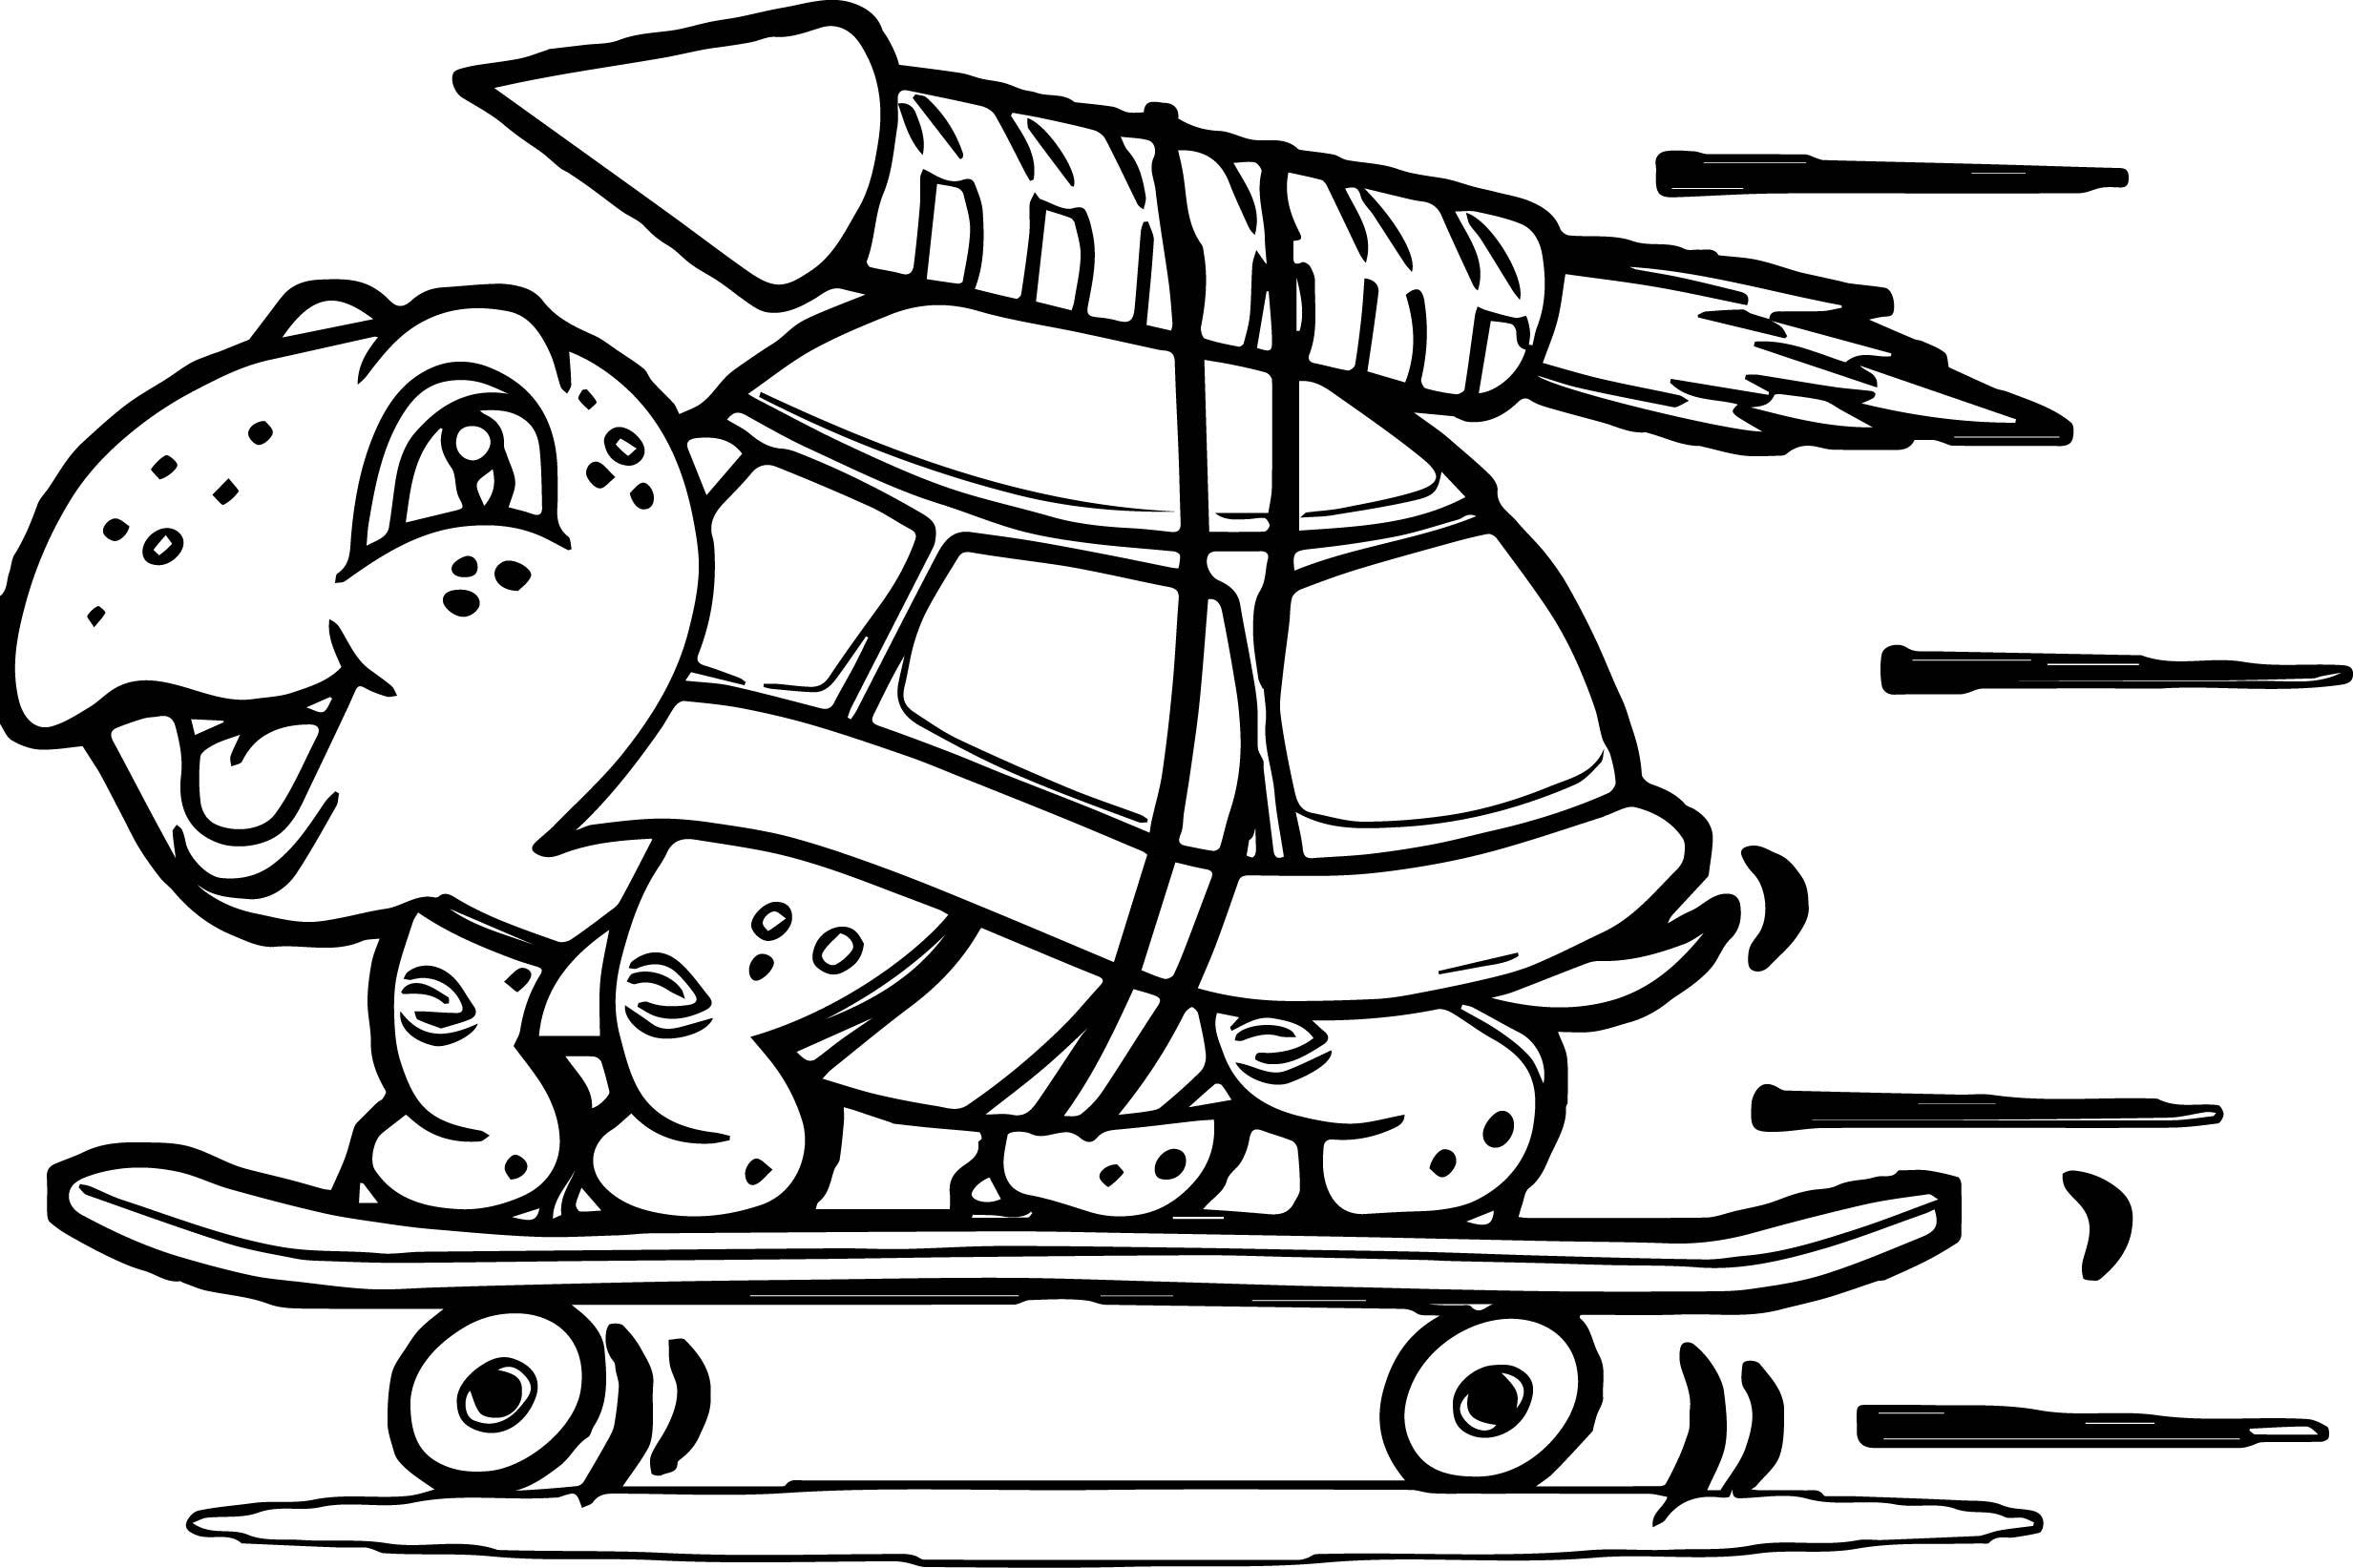 Tortoise Turtle Skate Rocket Coloring Page